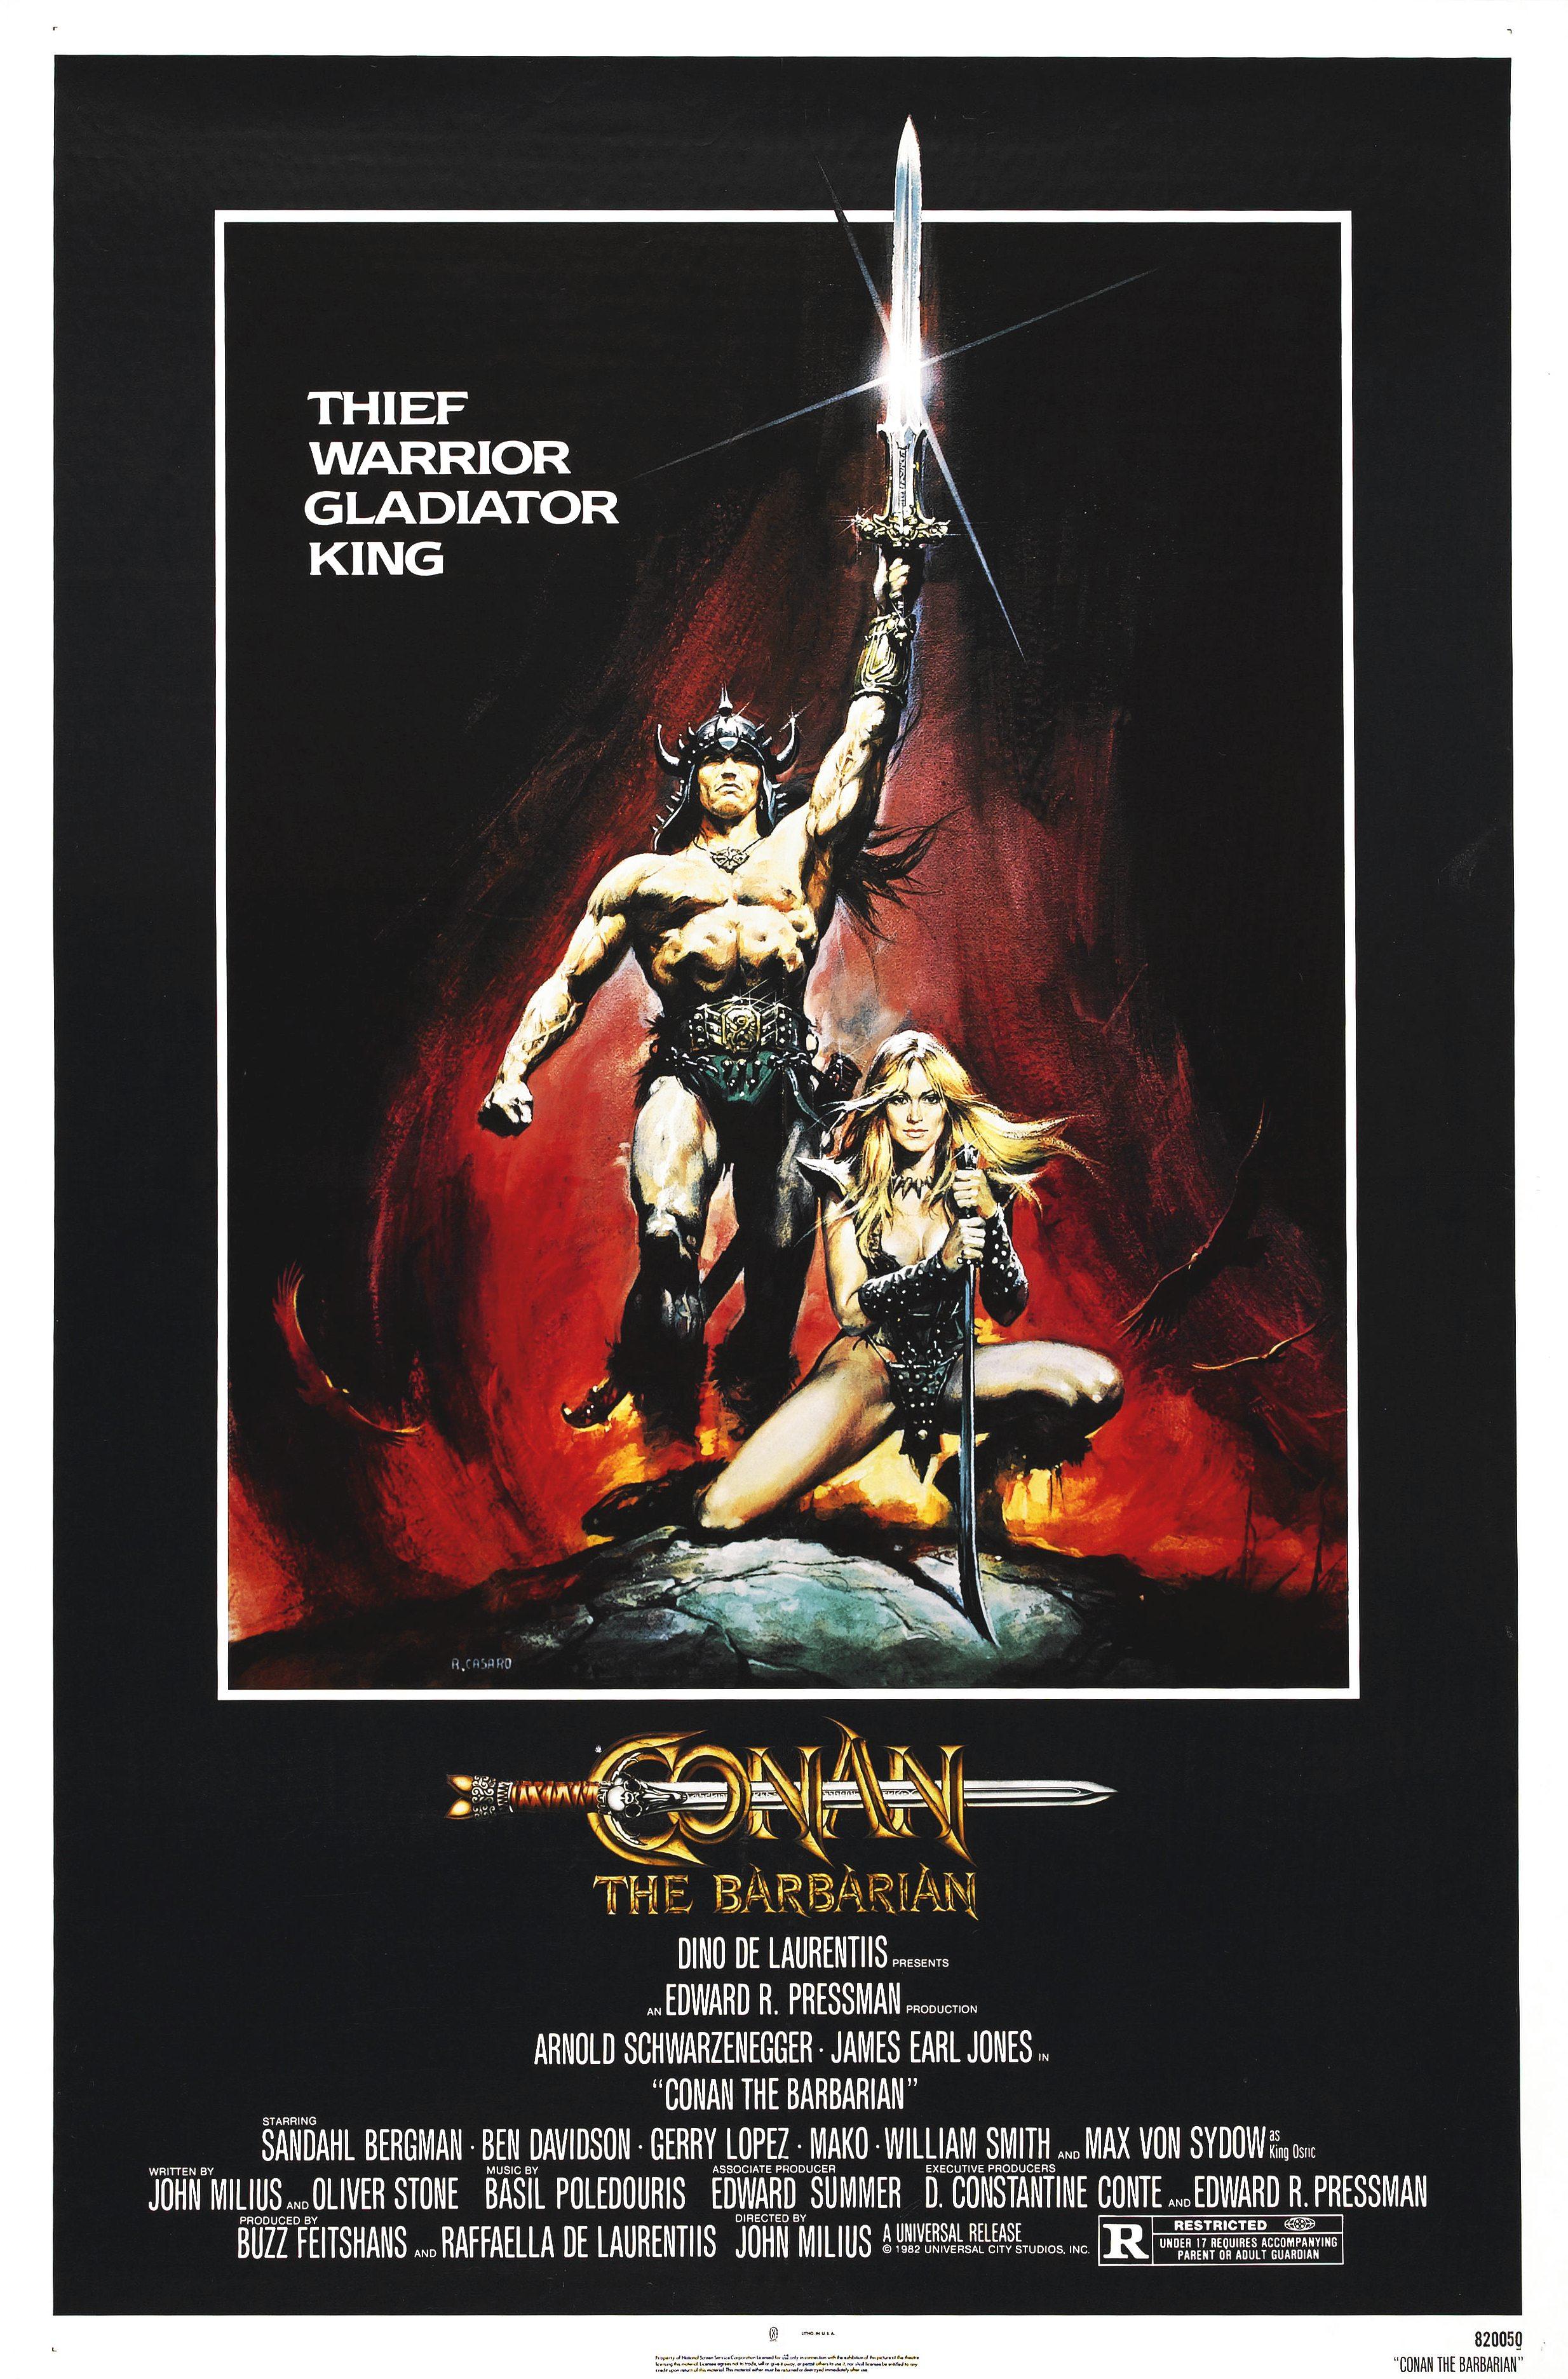 плакат фильма Конан-варвар